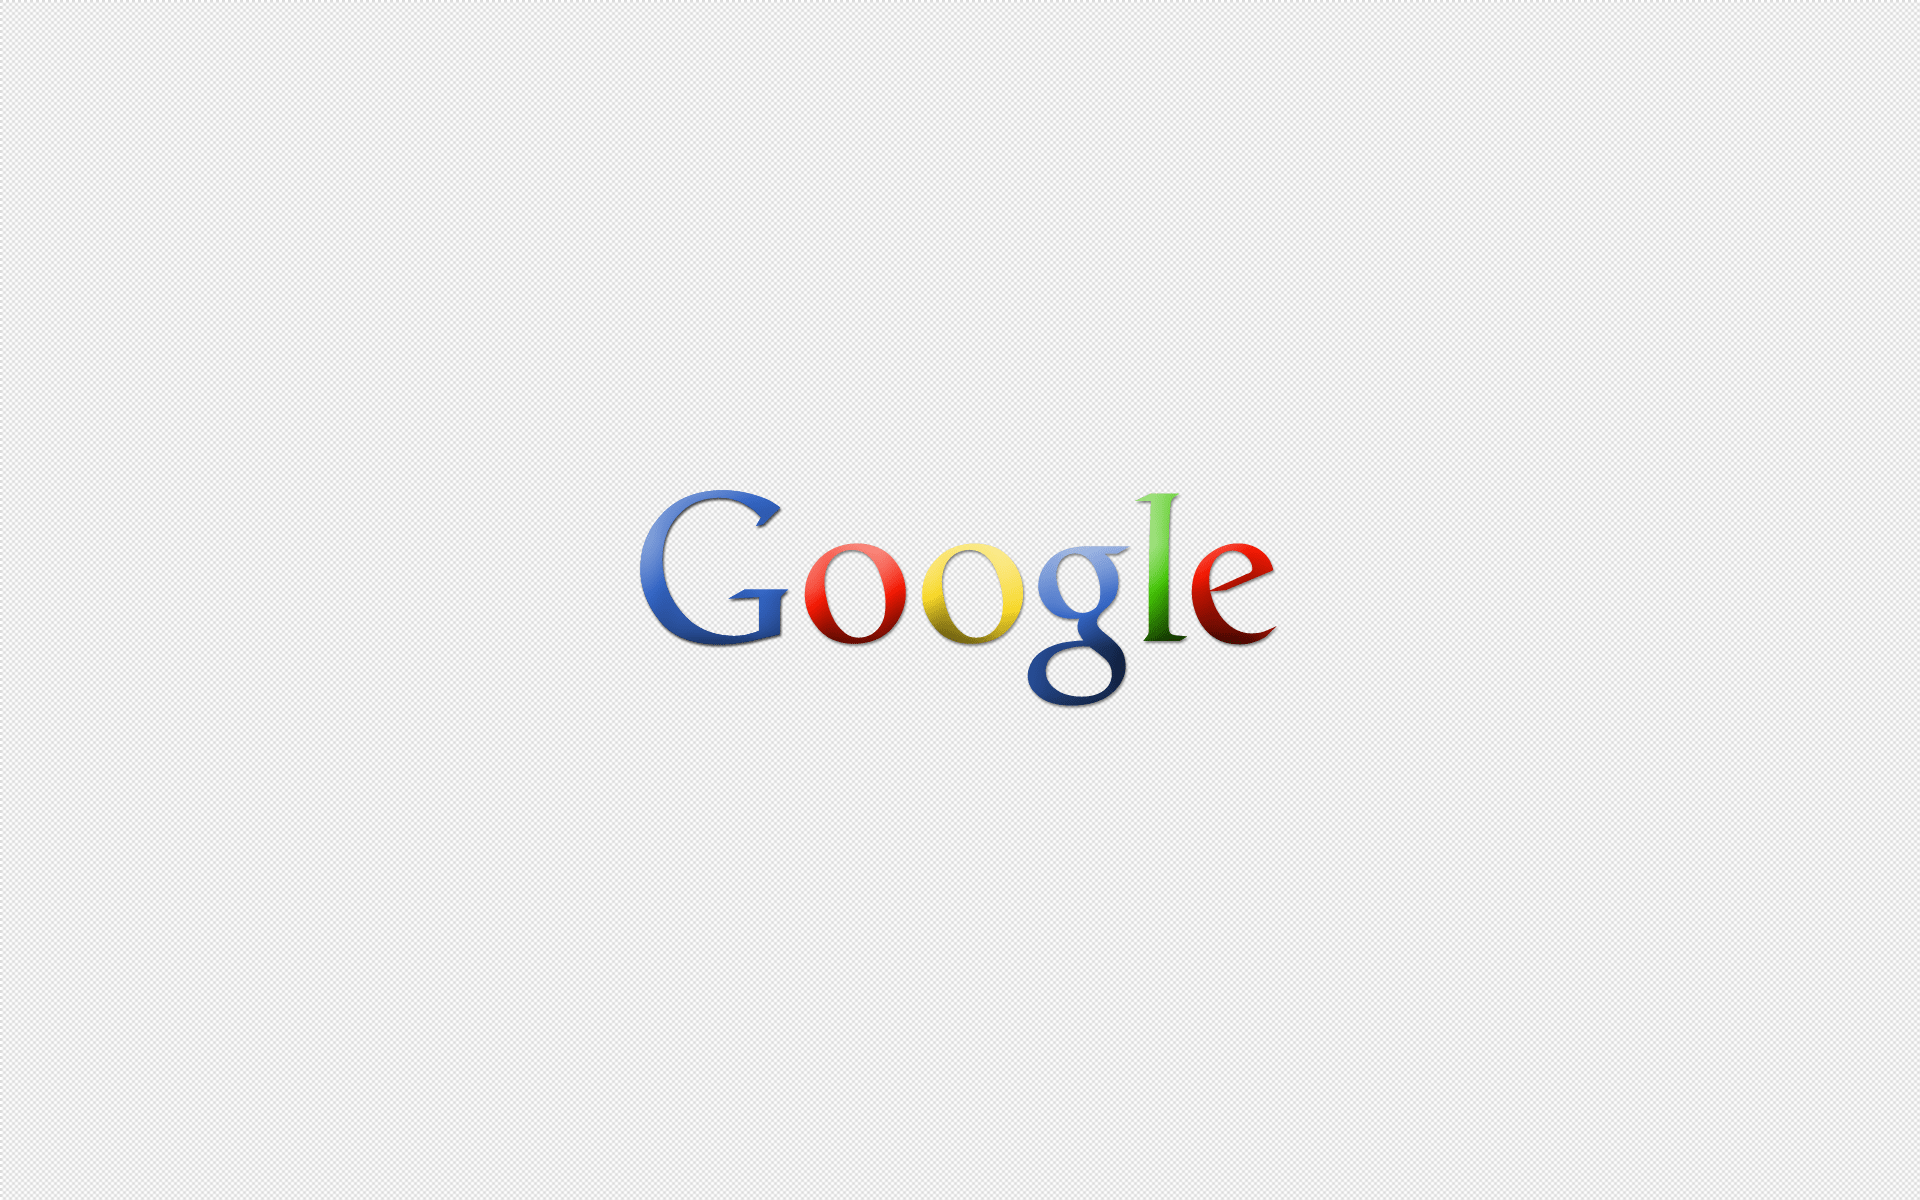 Google Wallpapers hd